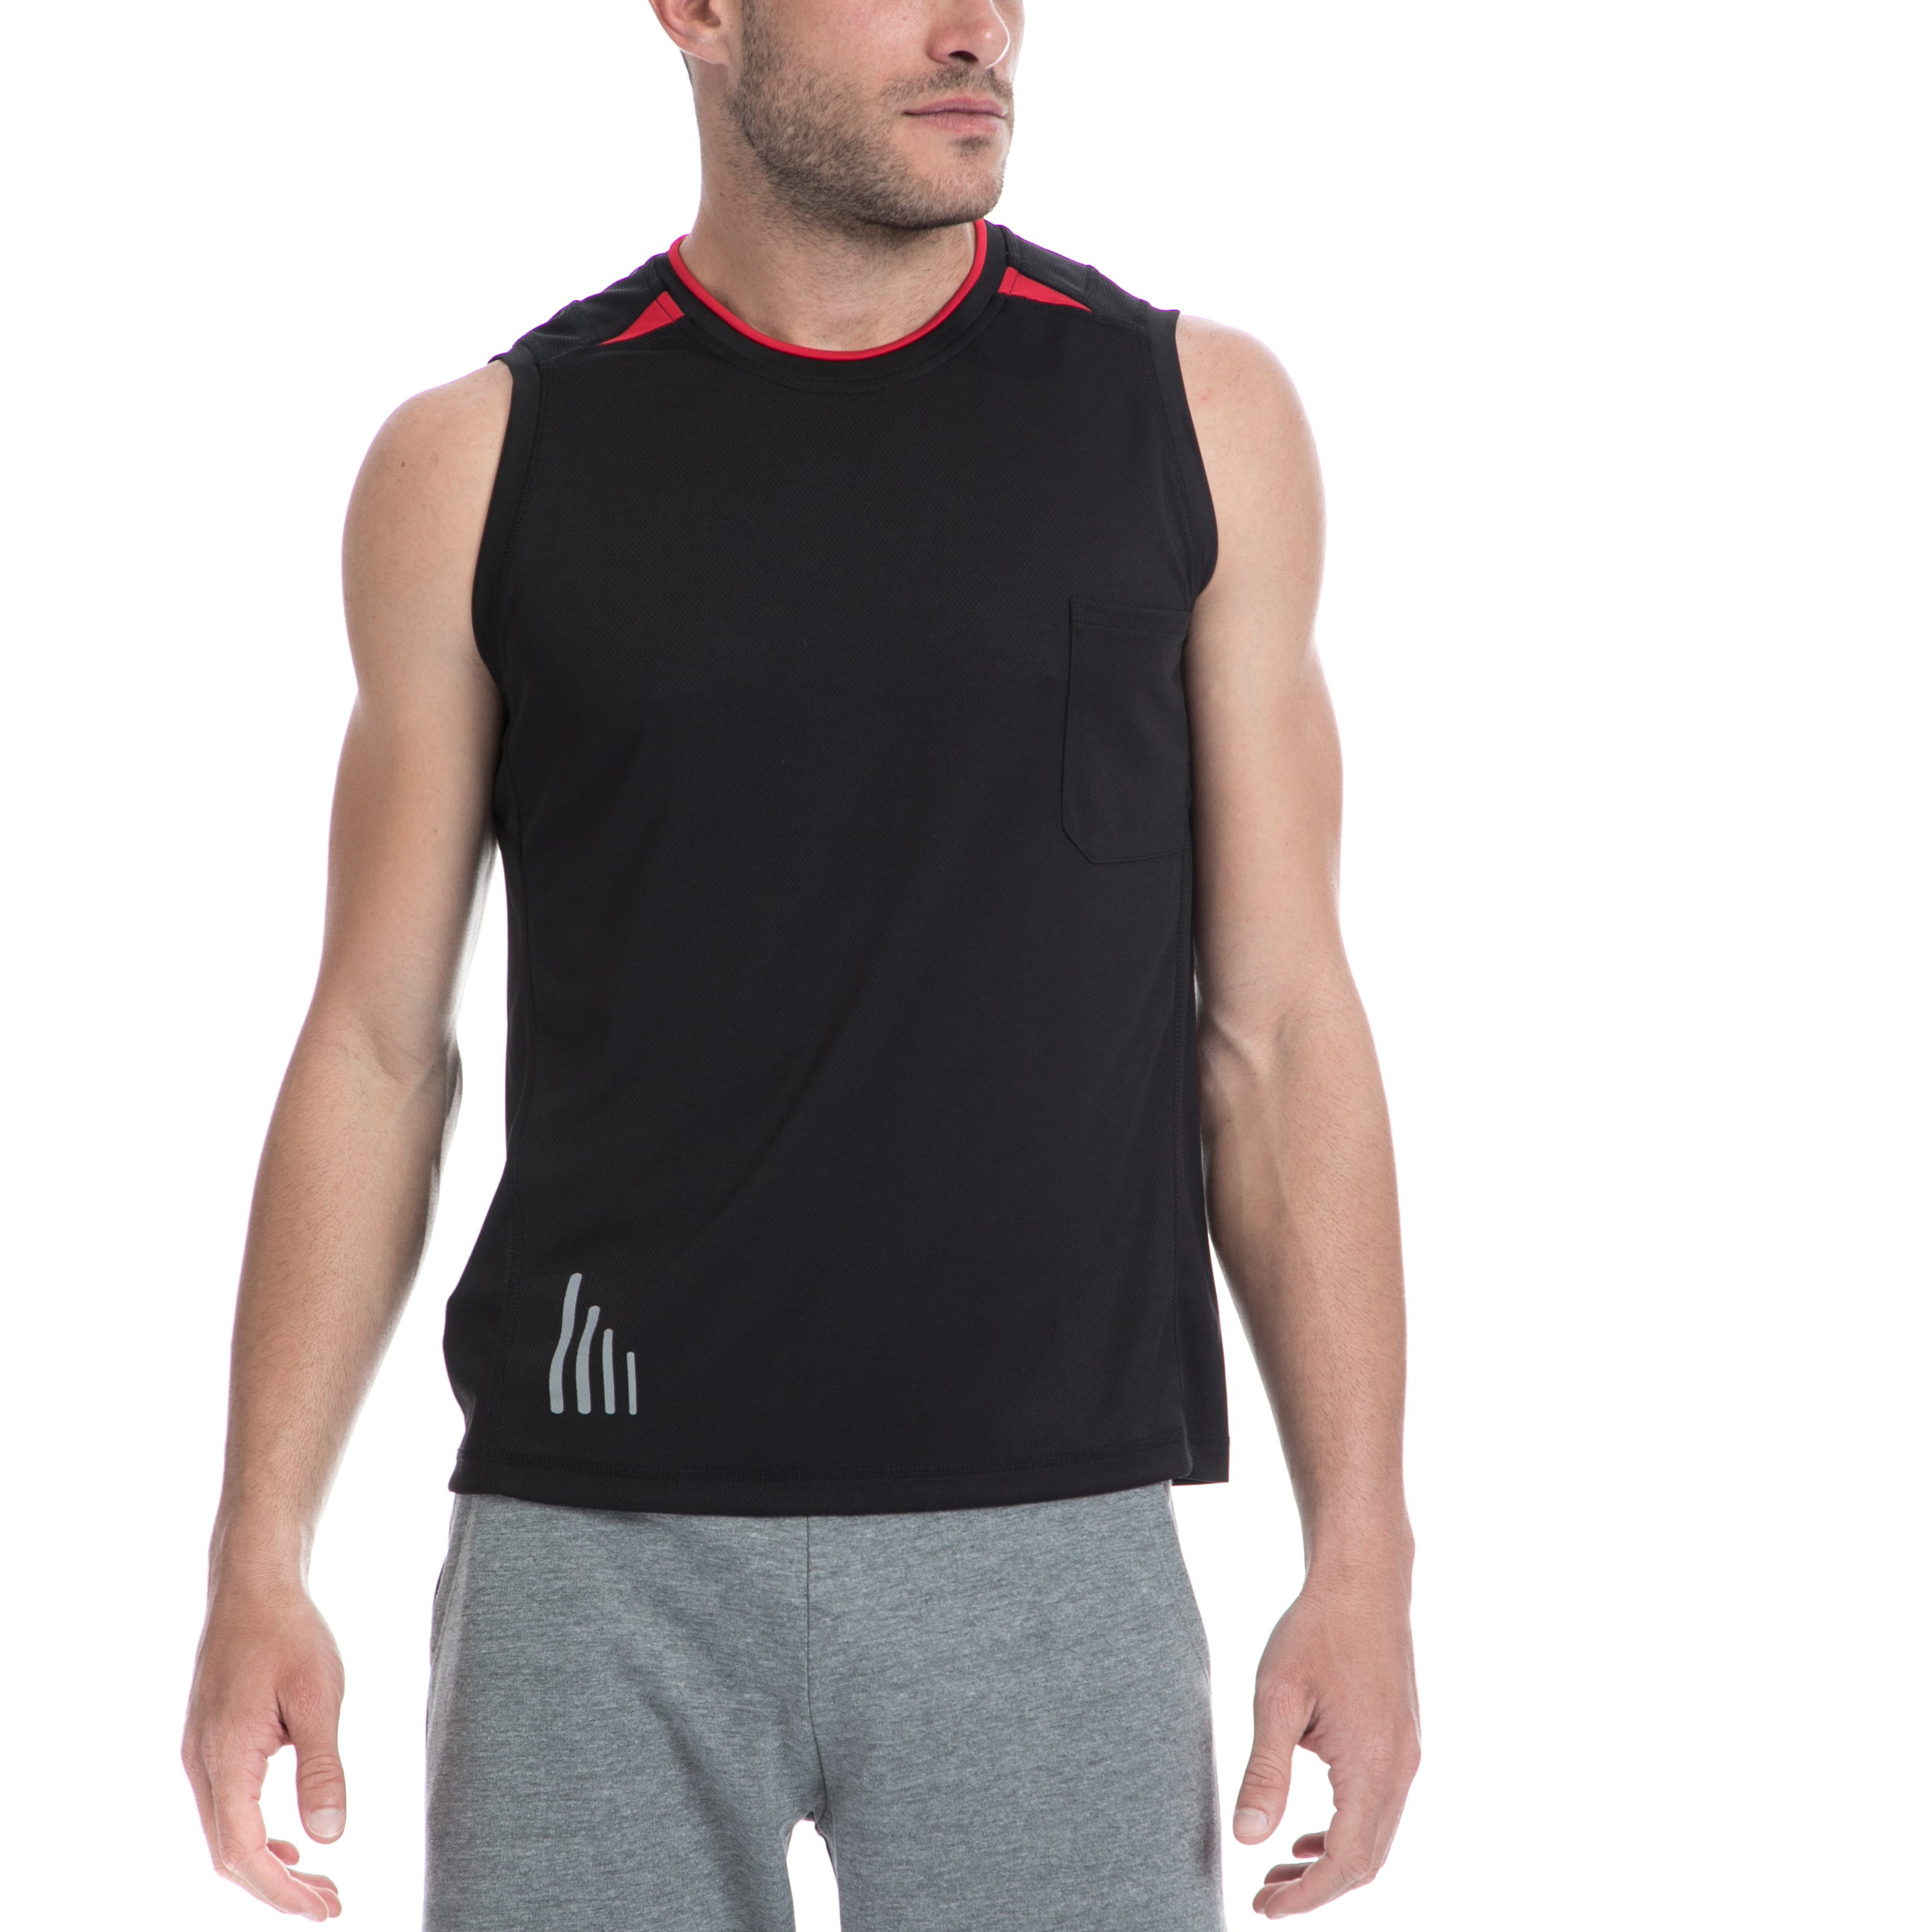 BODYTALK - Ανδρική αμάνικη μπλούζα BODYTALK μαύρη ανδρικά ρούχα αθλητικά t shirt